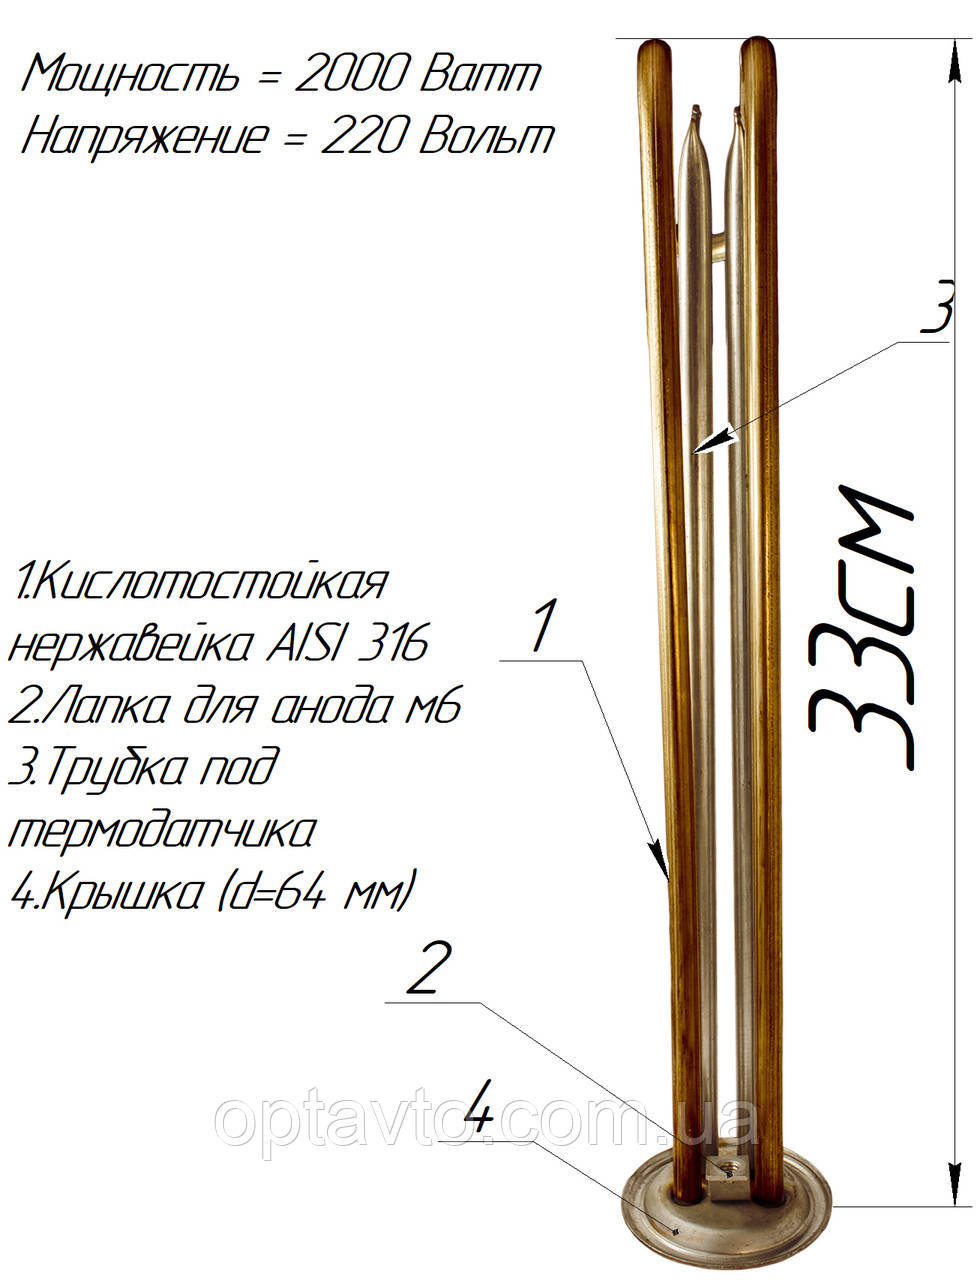 ТЭН изогнутой формы 2000w на фланце , с местом под анод м6 (Украина) Медь